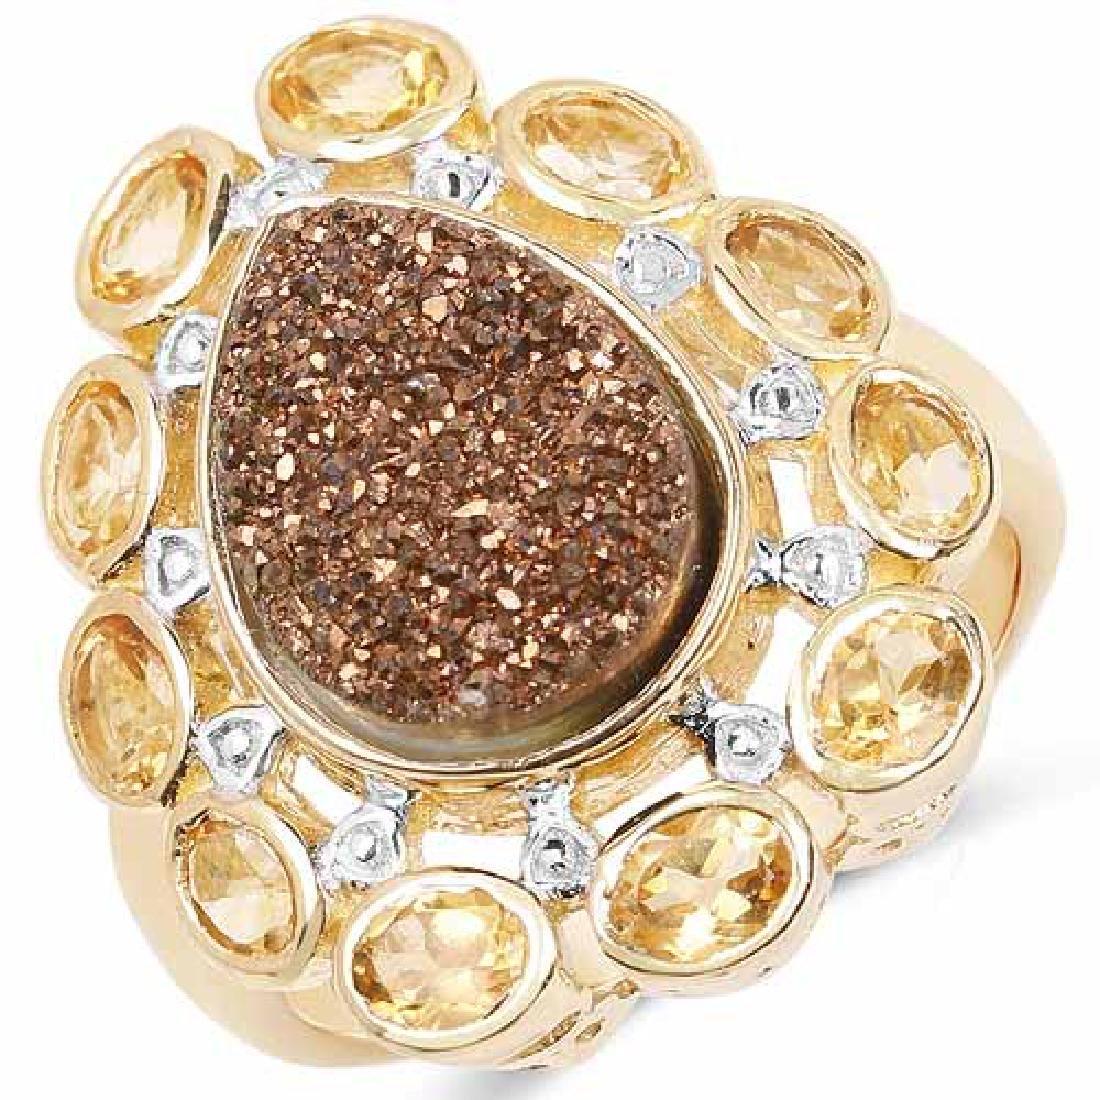 14K Yellow Gold Plated 5.14 Carat Genuine Bronze Drusy